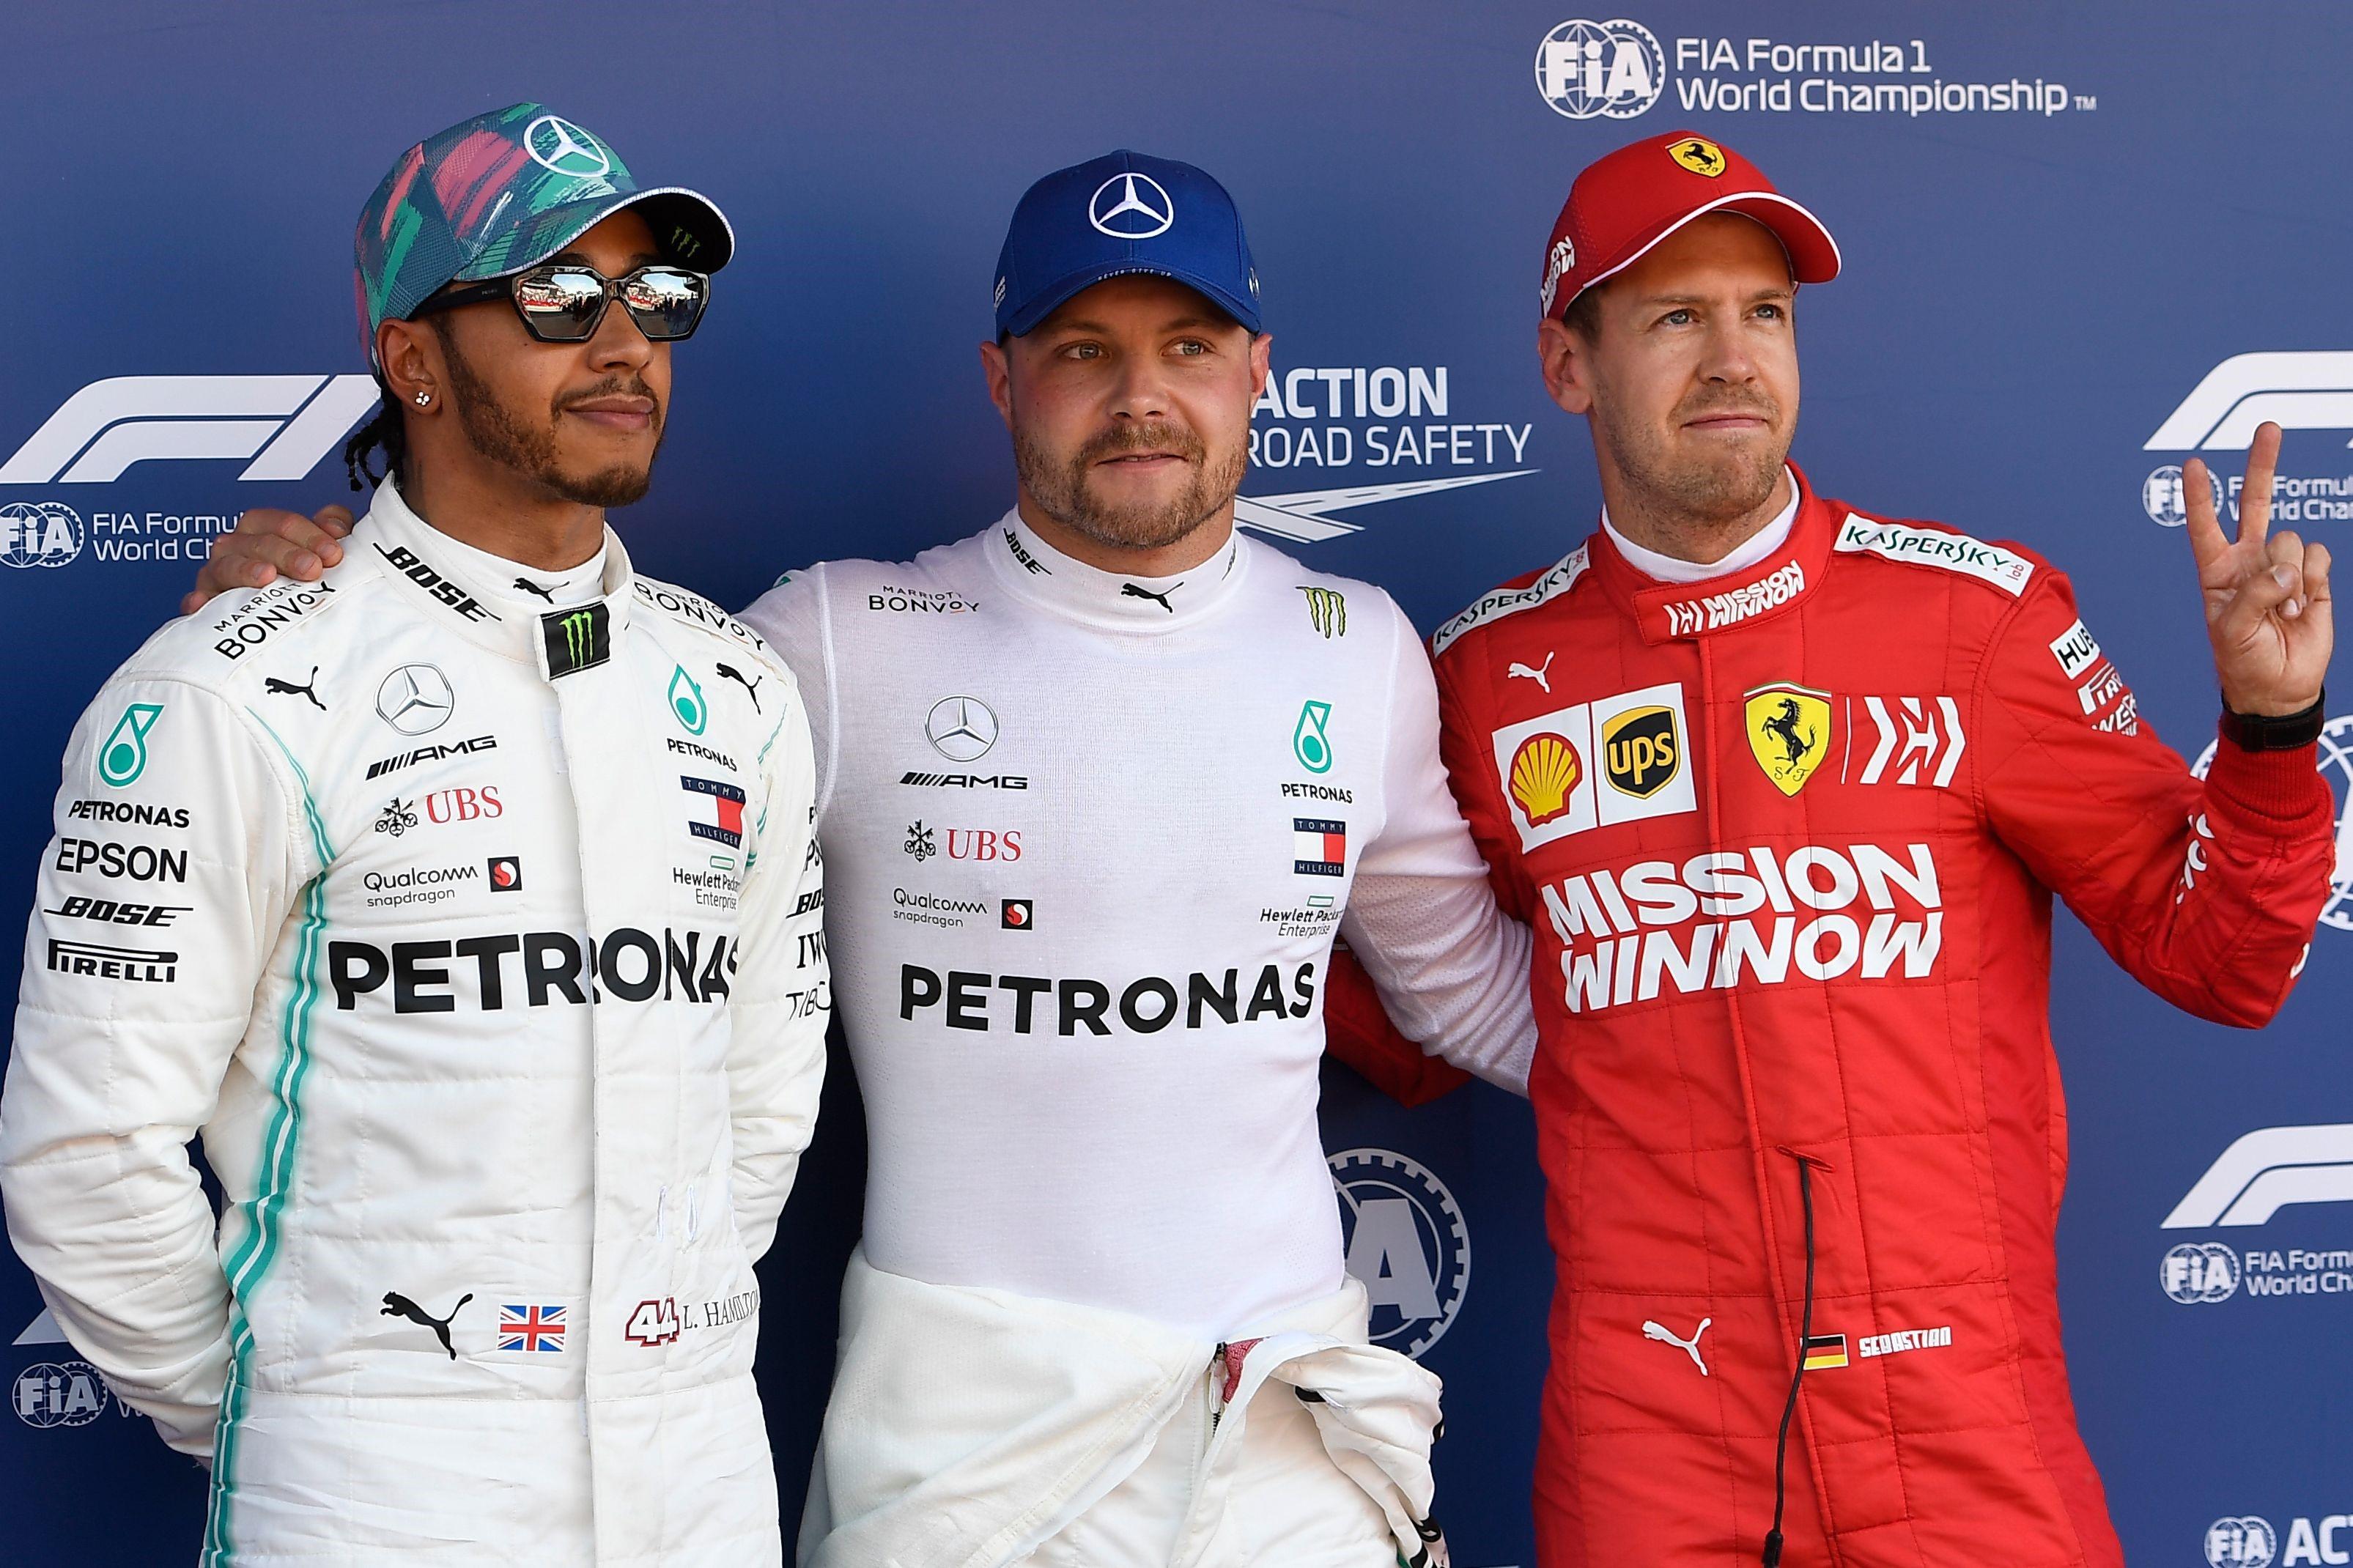 Lewis Hamilton, Valtteri Bottas (Mercedes) et Sebastian Vettel (Ferrari) au Grand Prix d'Espagne 2019